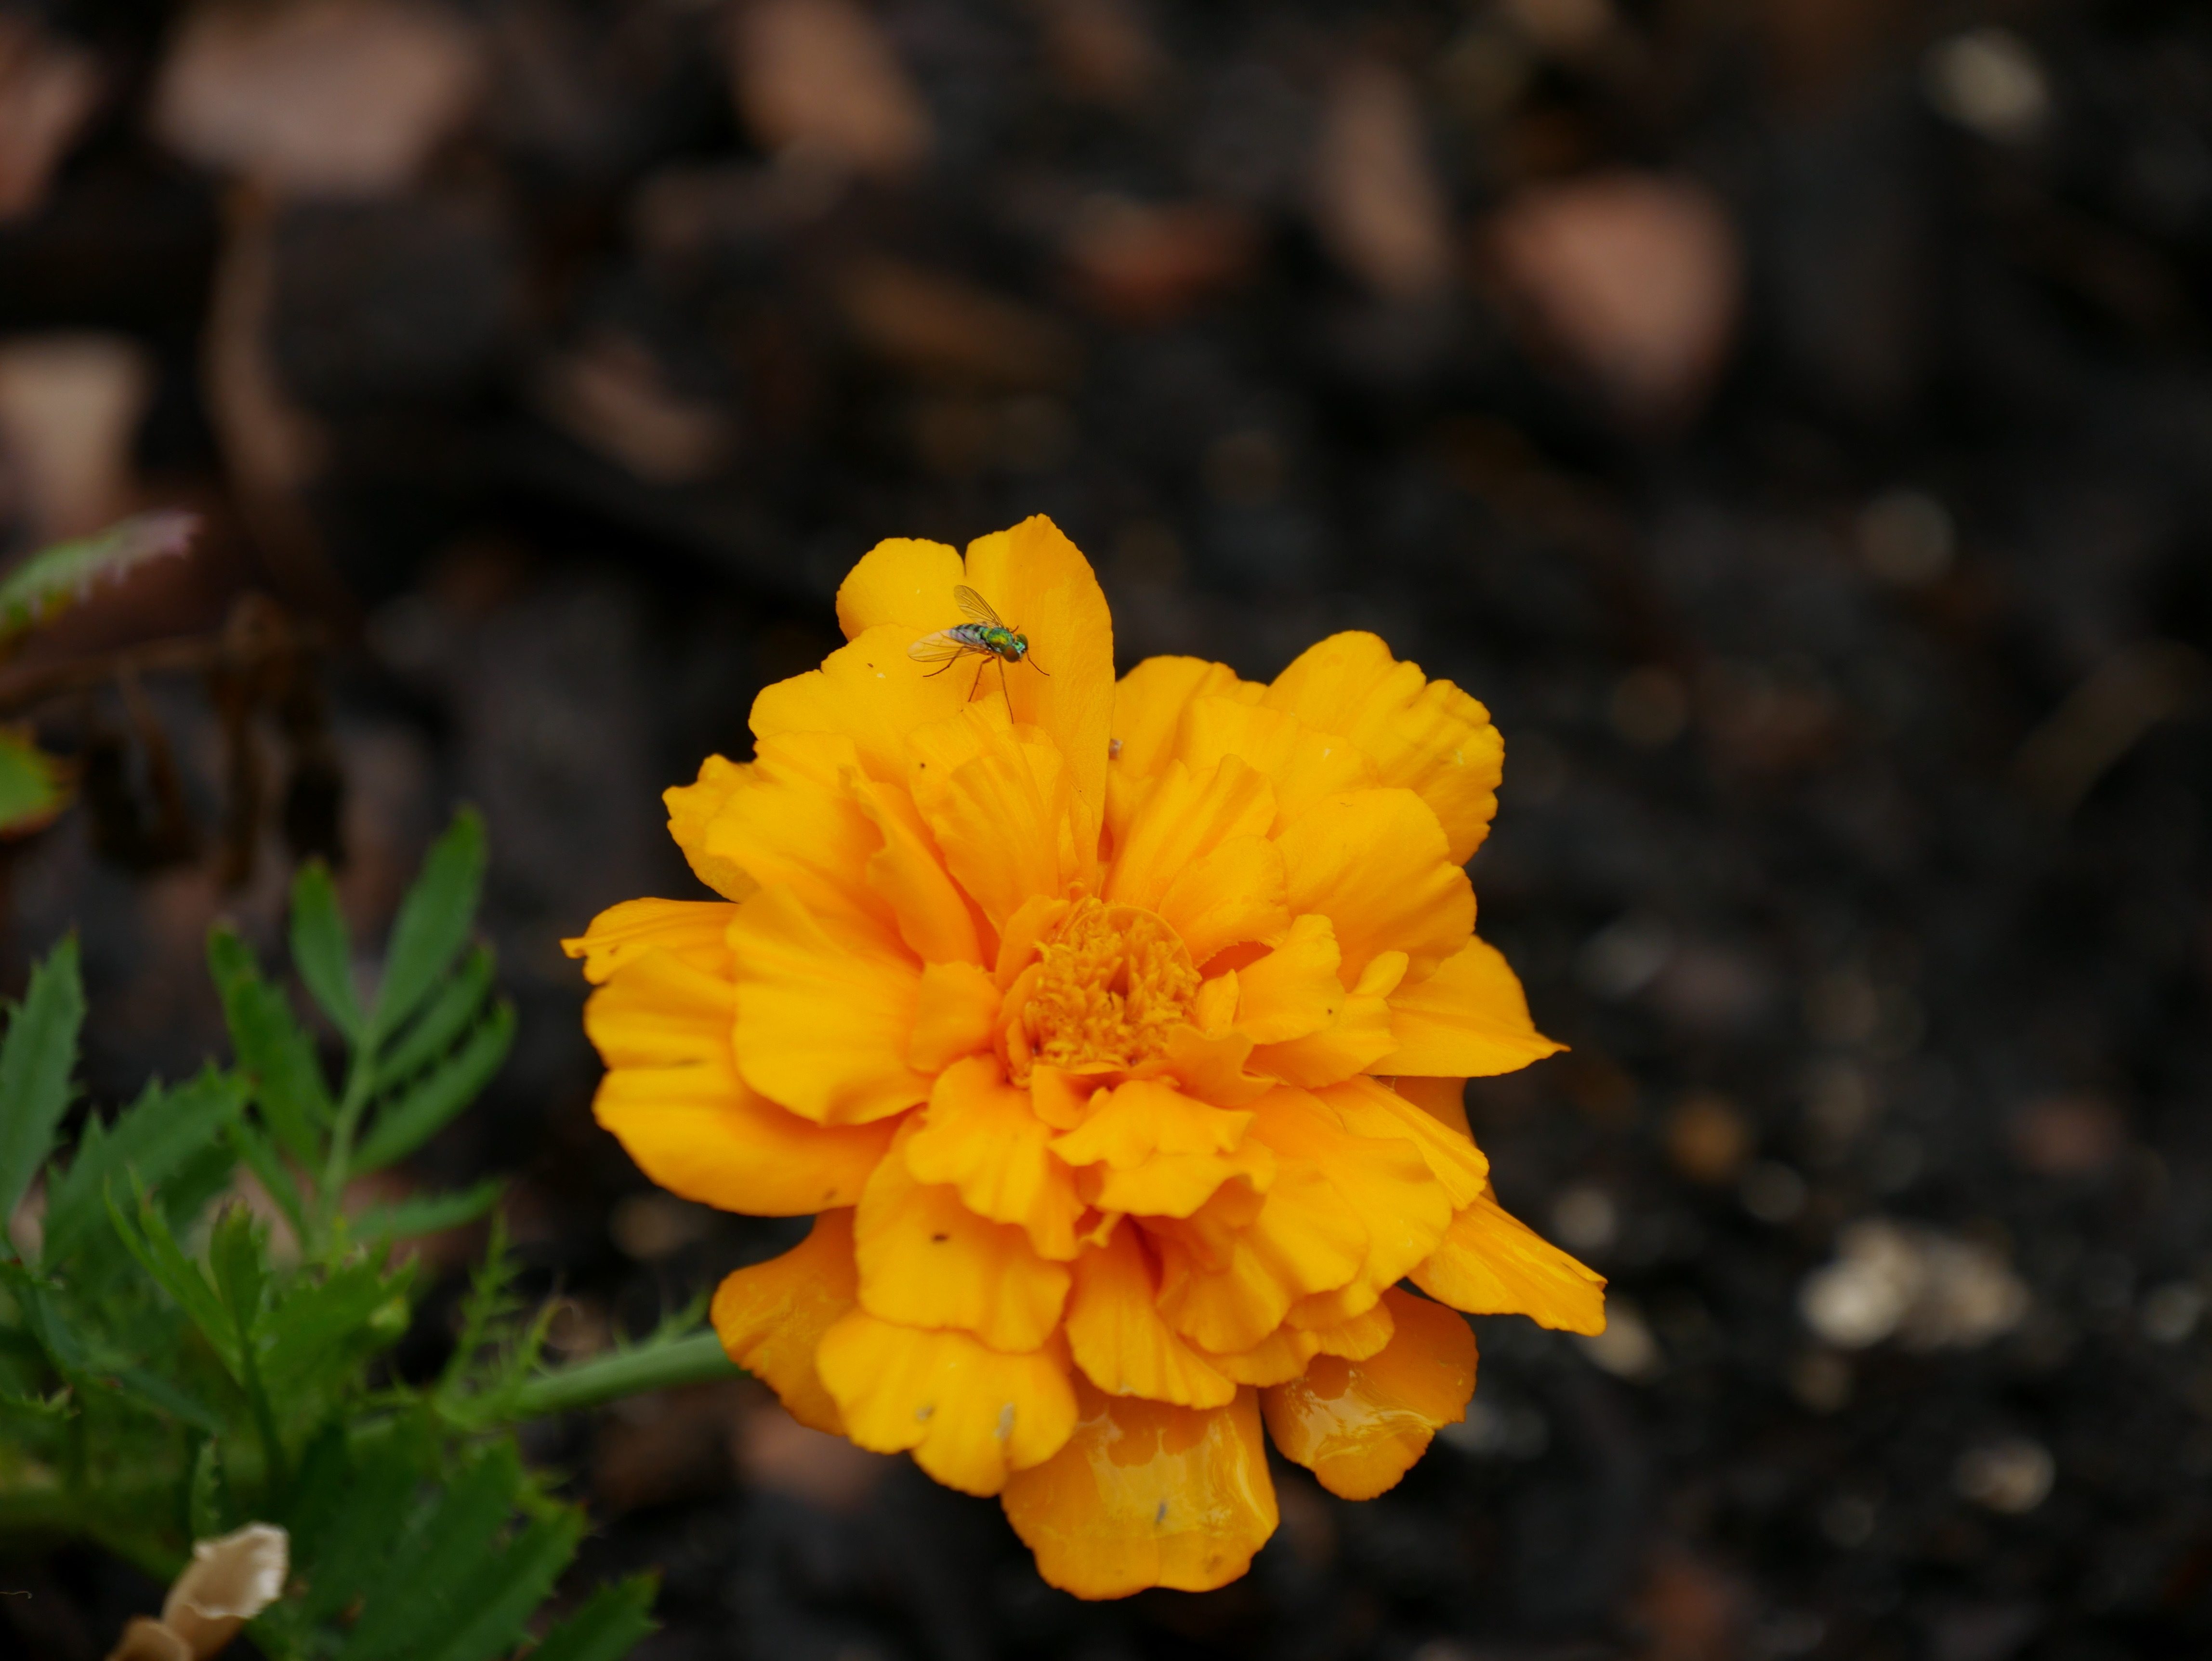 washinton gardens#1 (15 of 26)